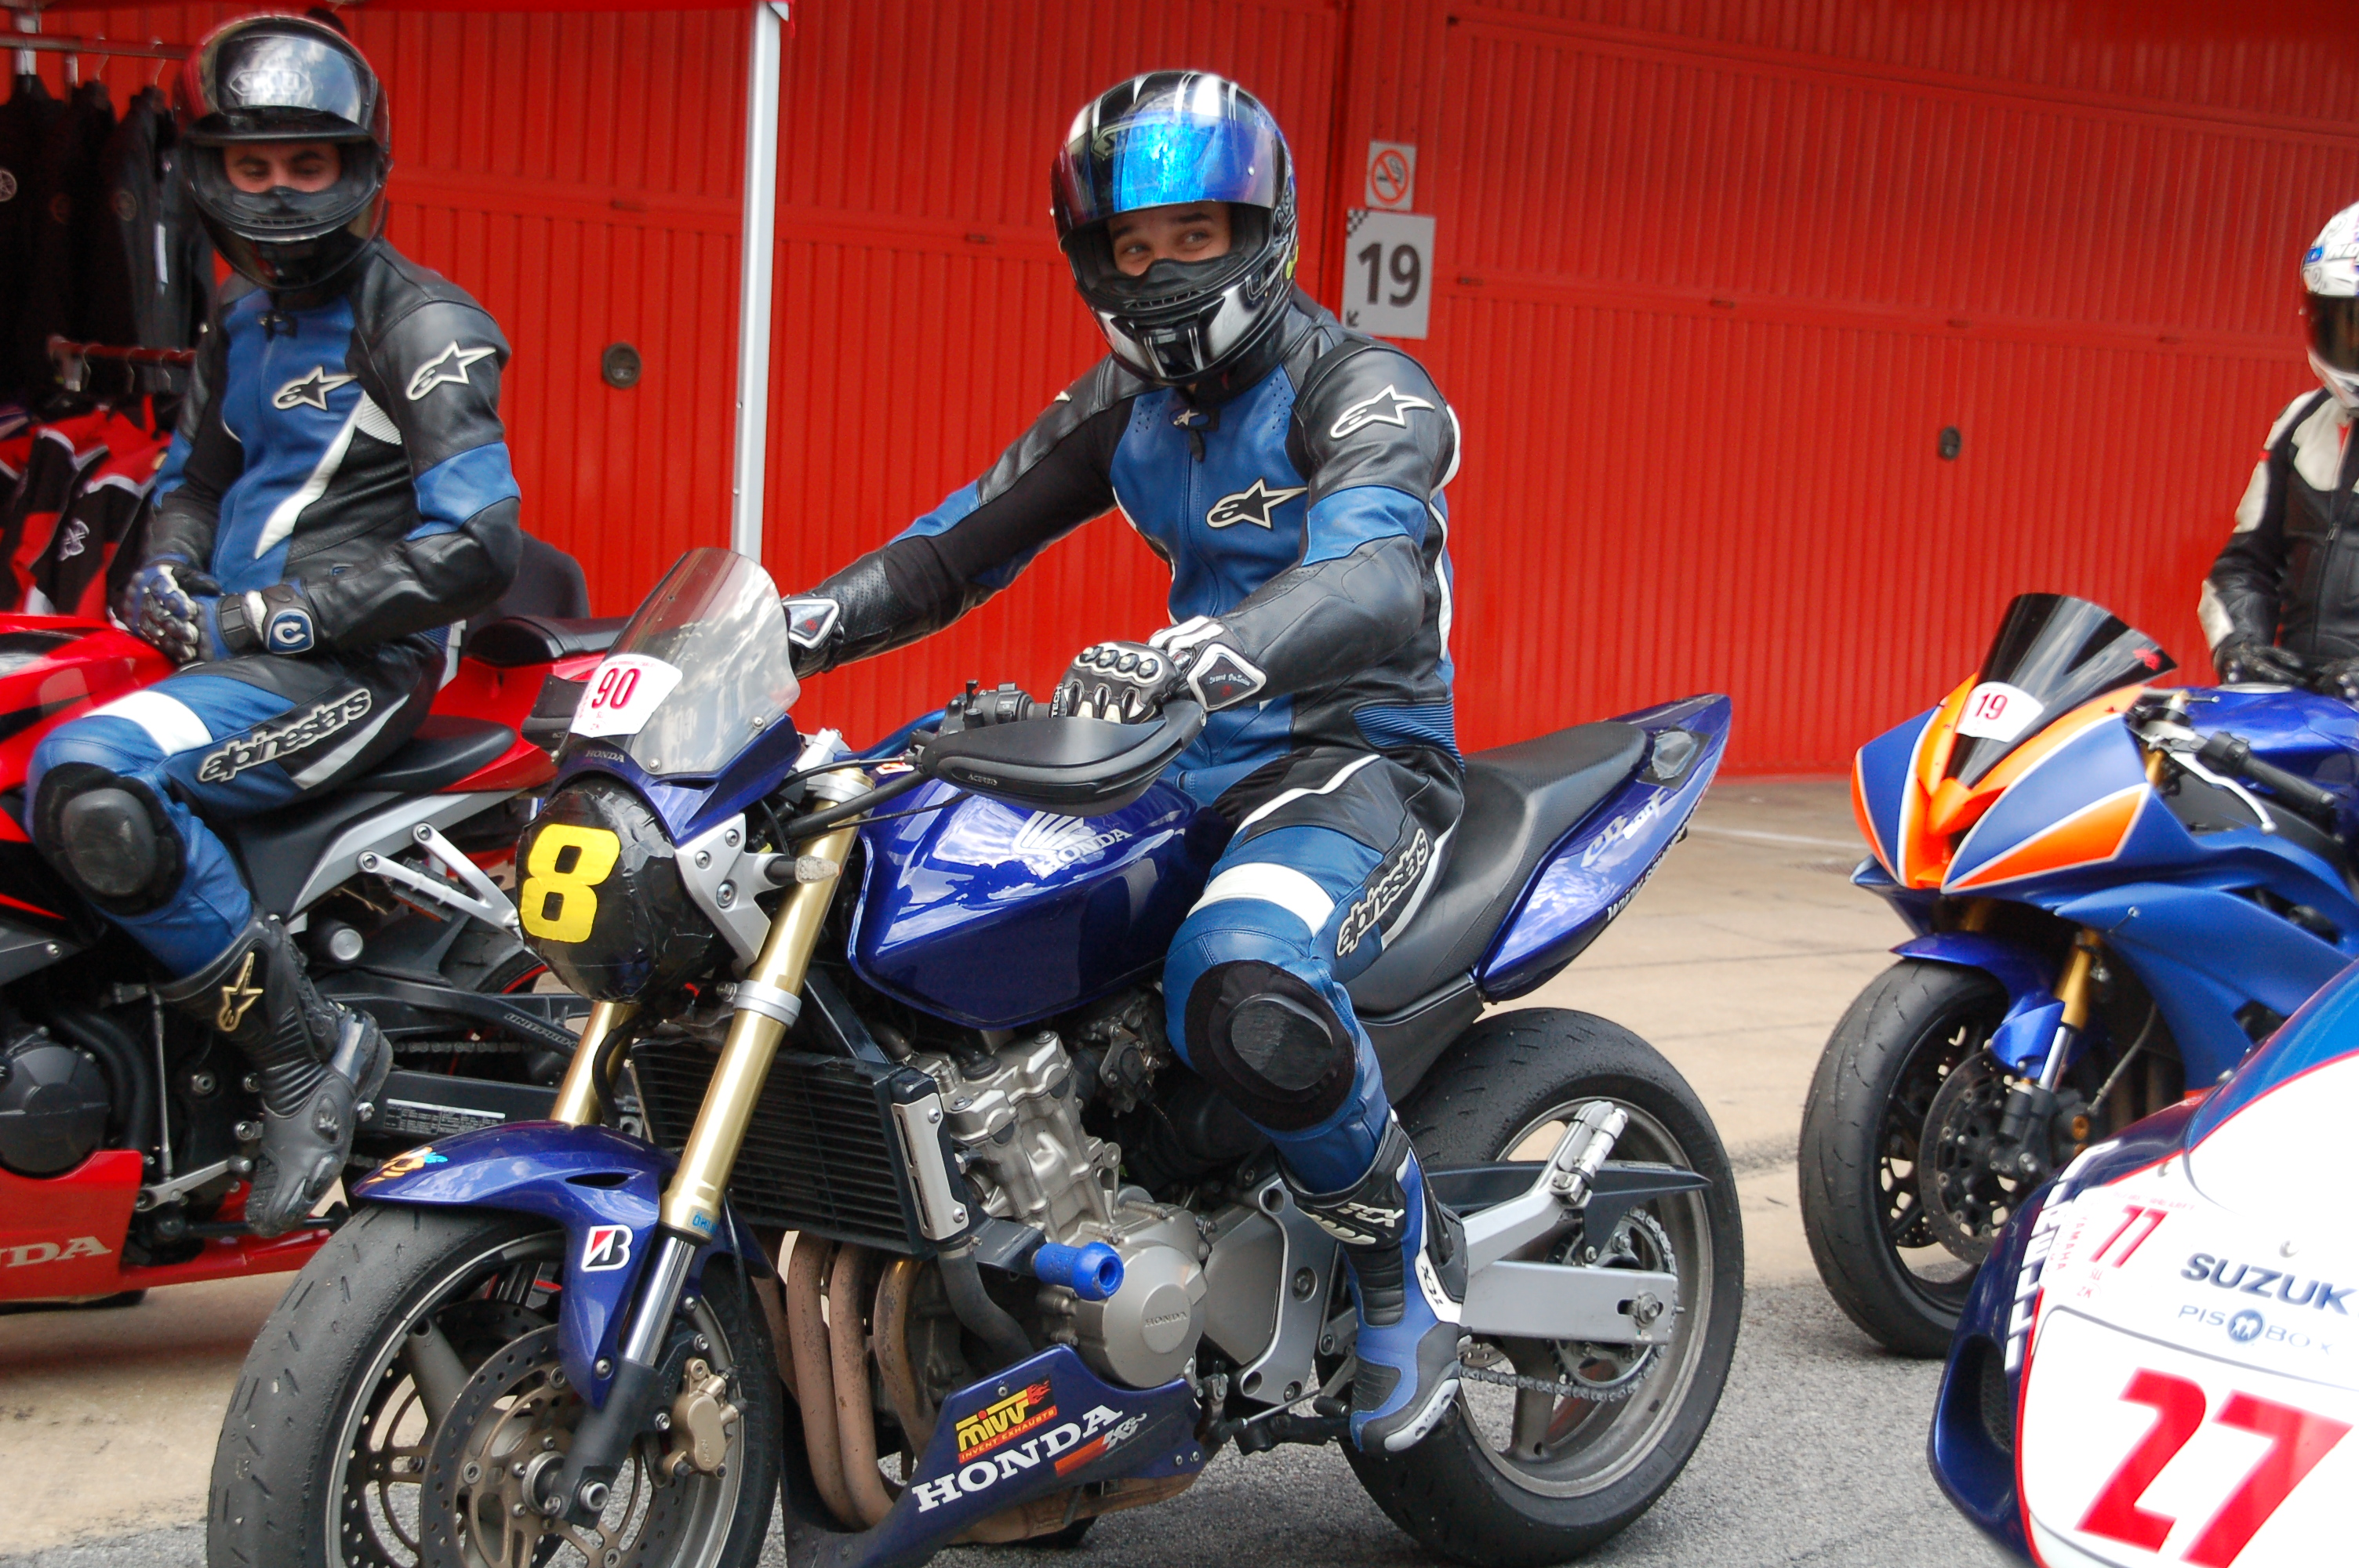 Carlos, Hornet 600 2006